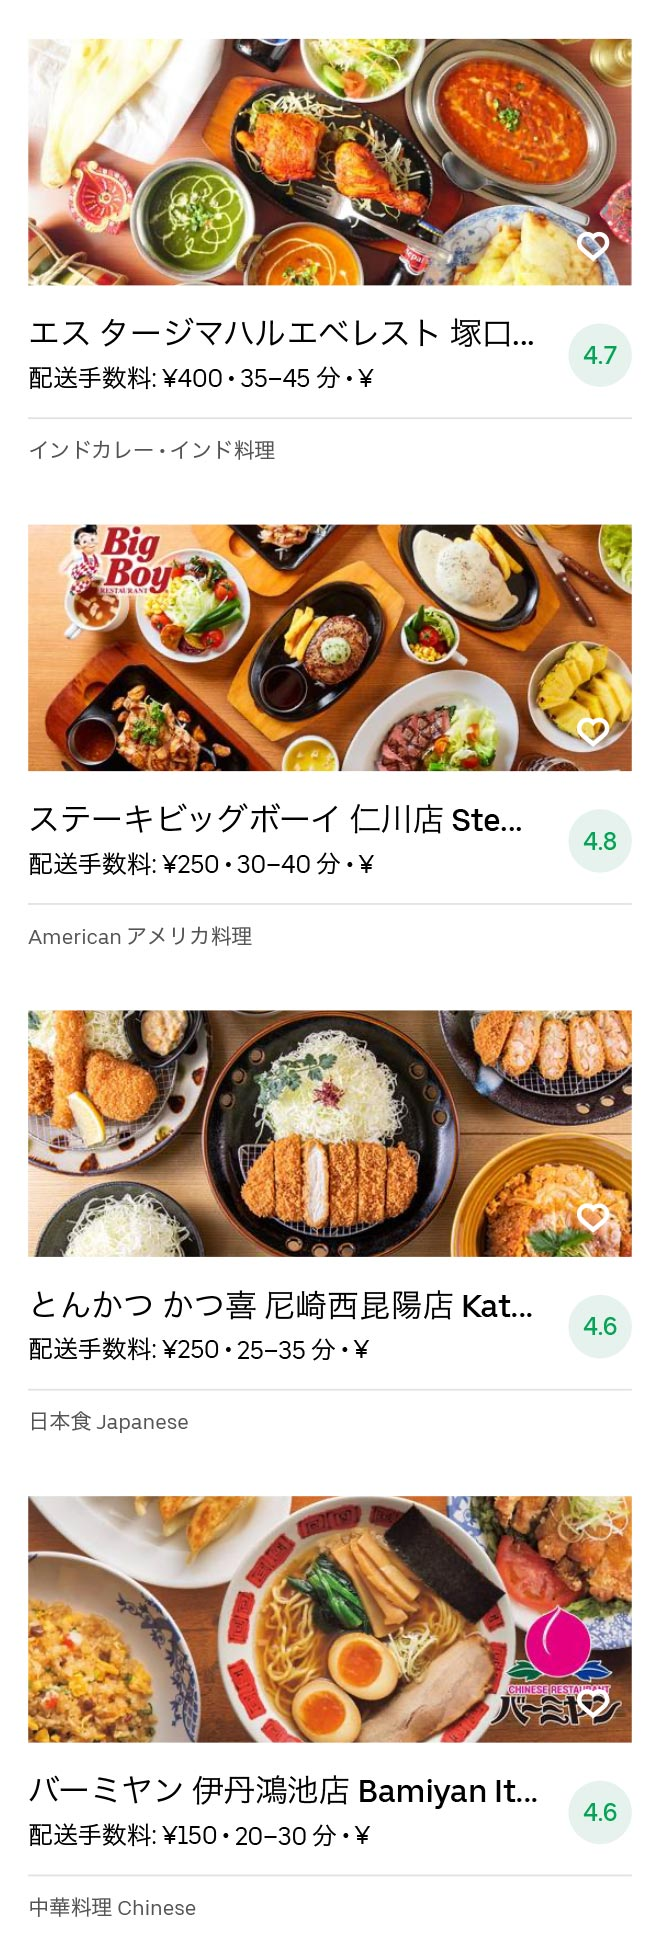 Itami sakuradai menu 2007 05